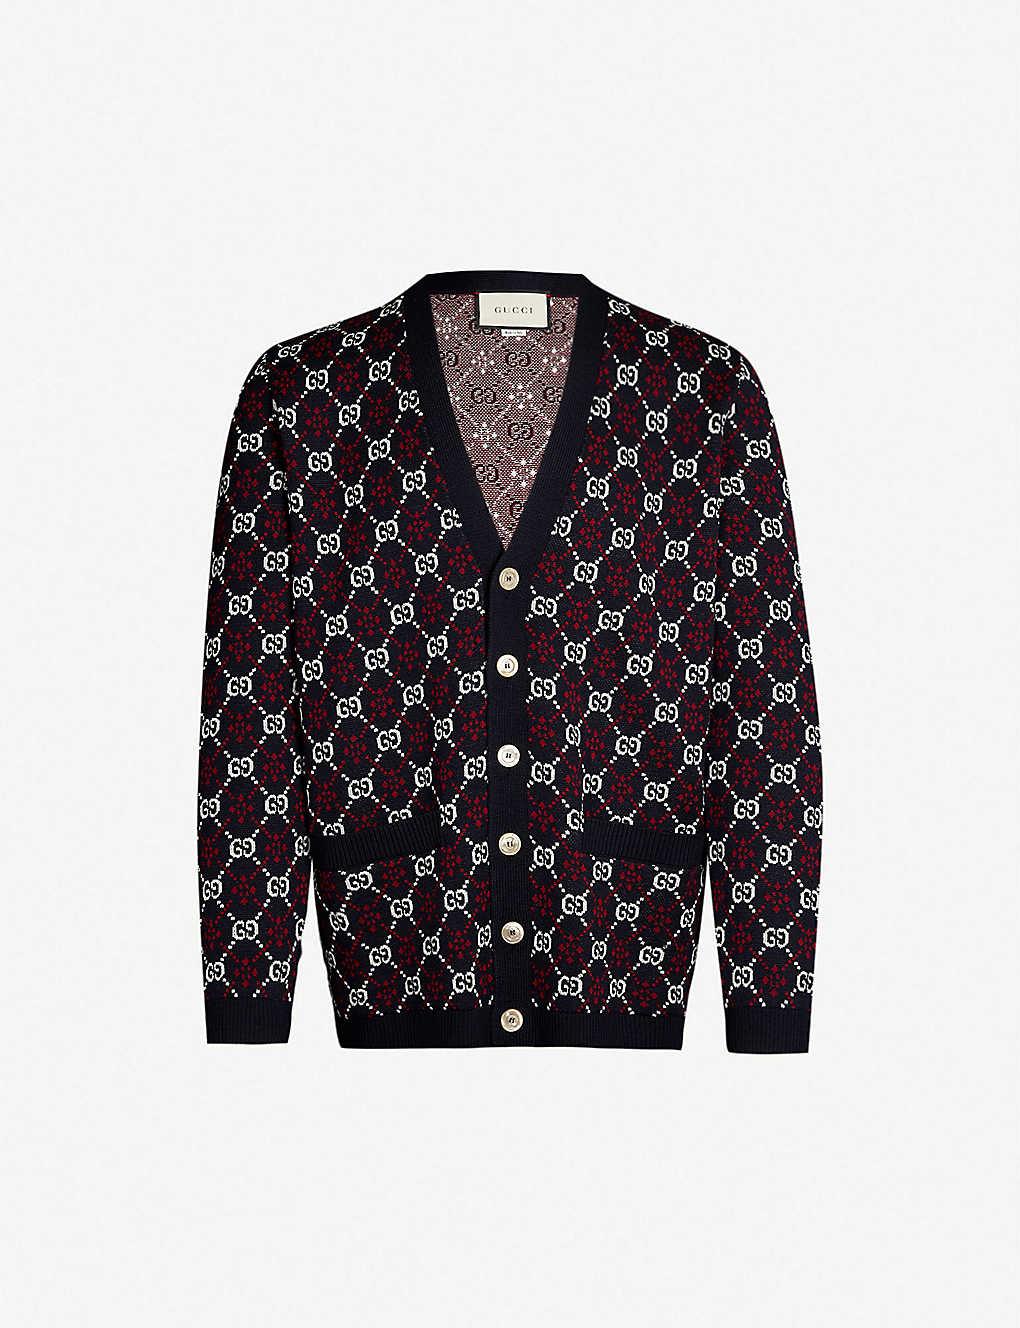 9649ebbe GUCCI - GG-motif cotton and wool-blend cardigan | Selfridges.com